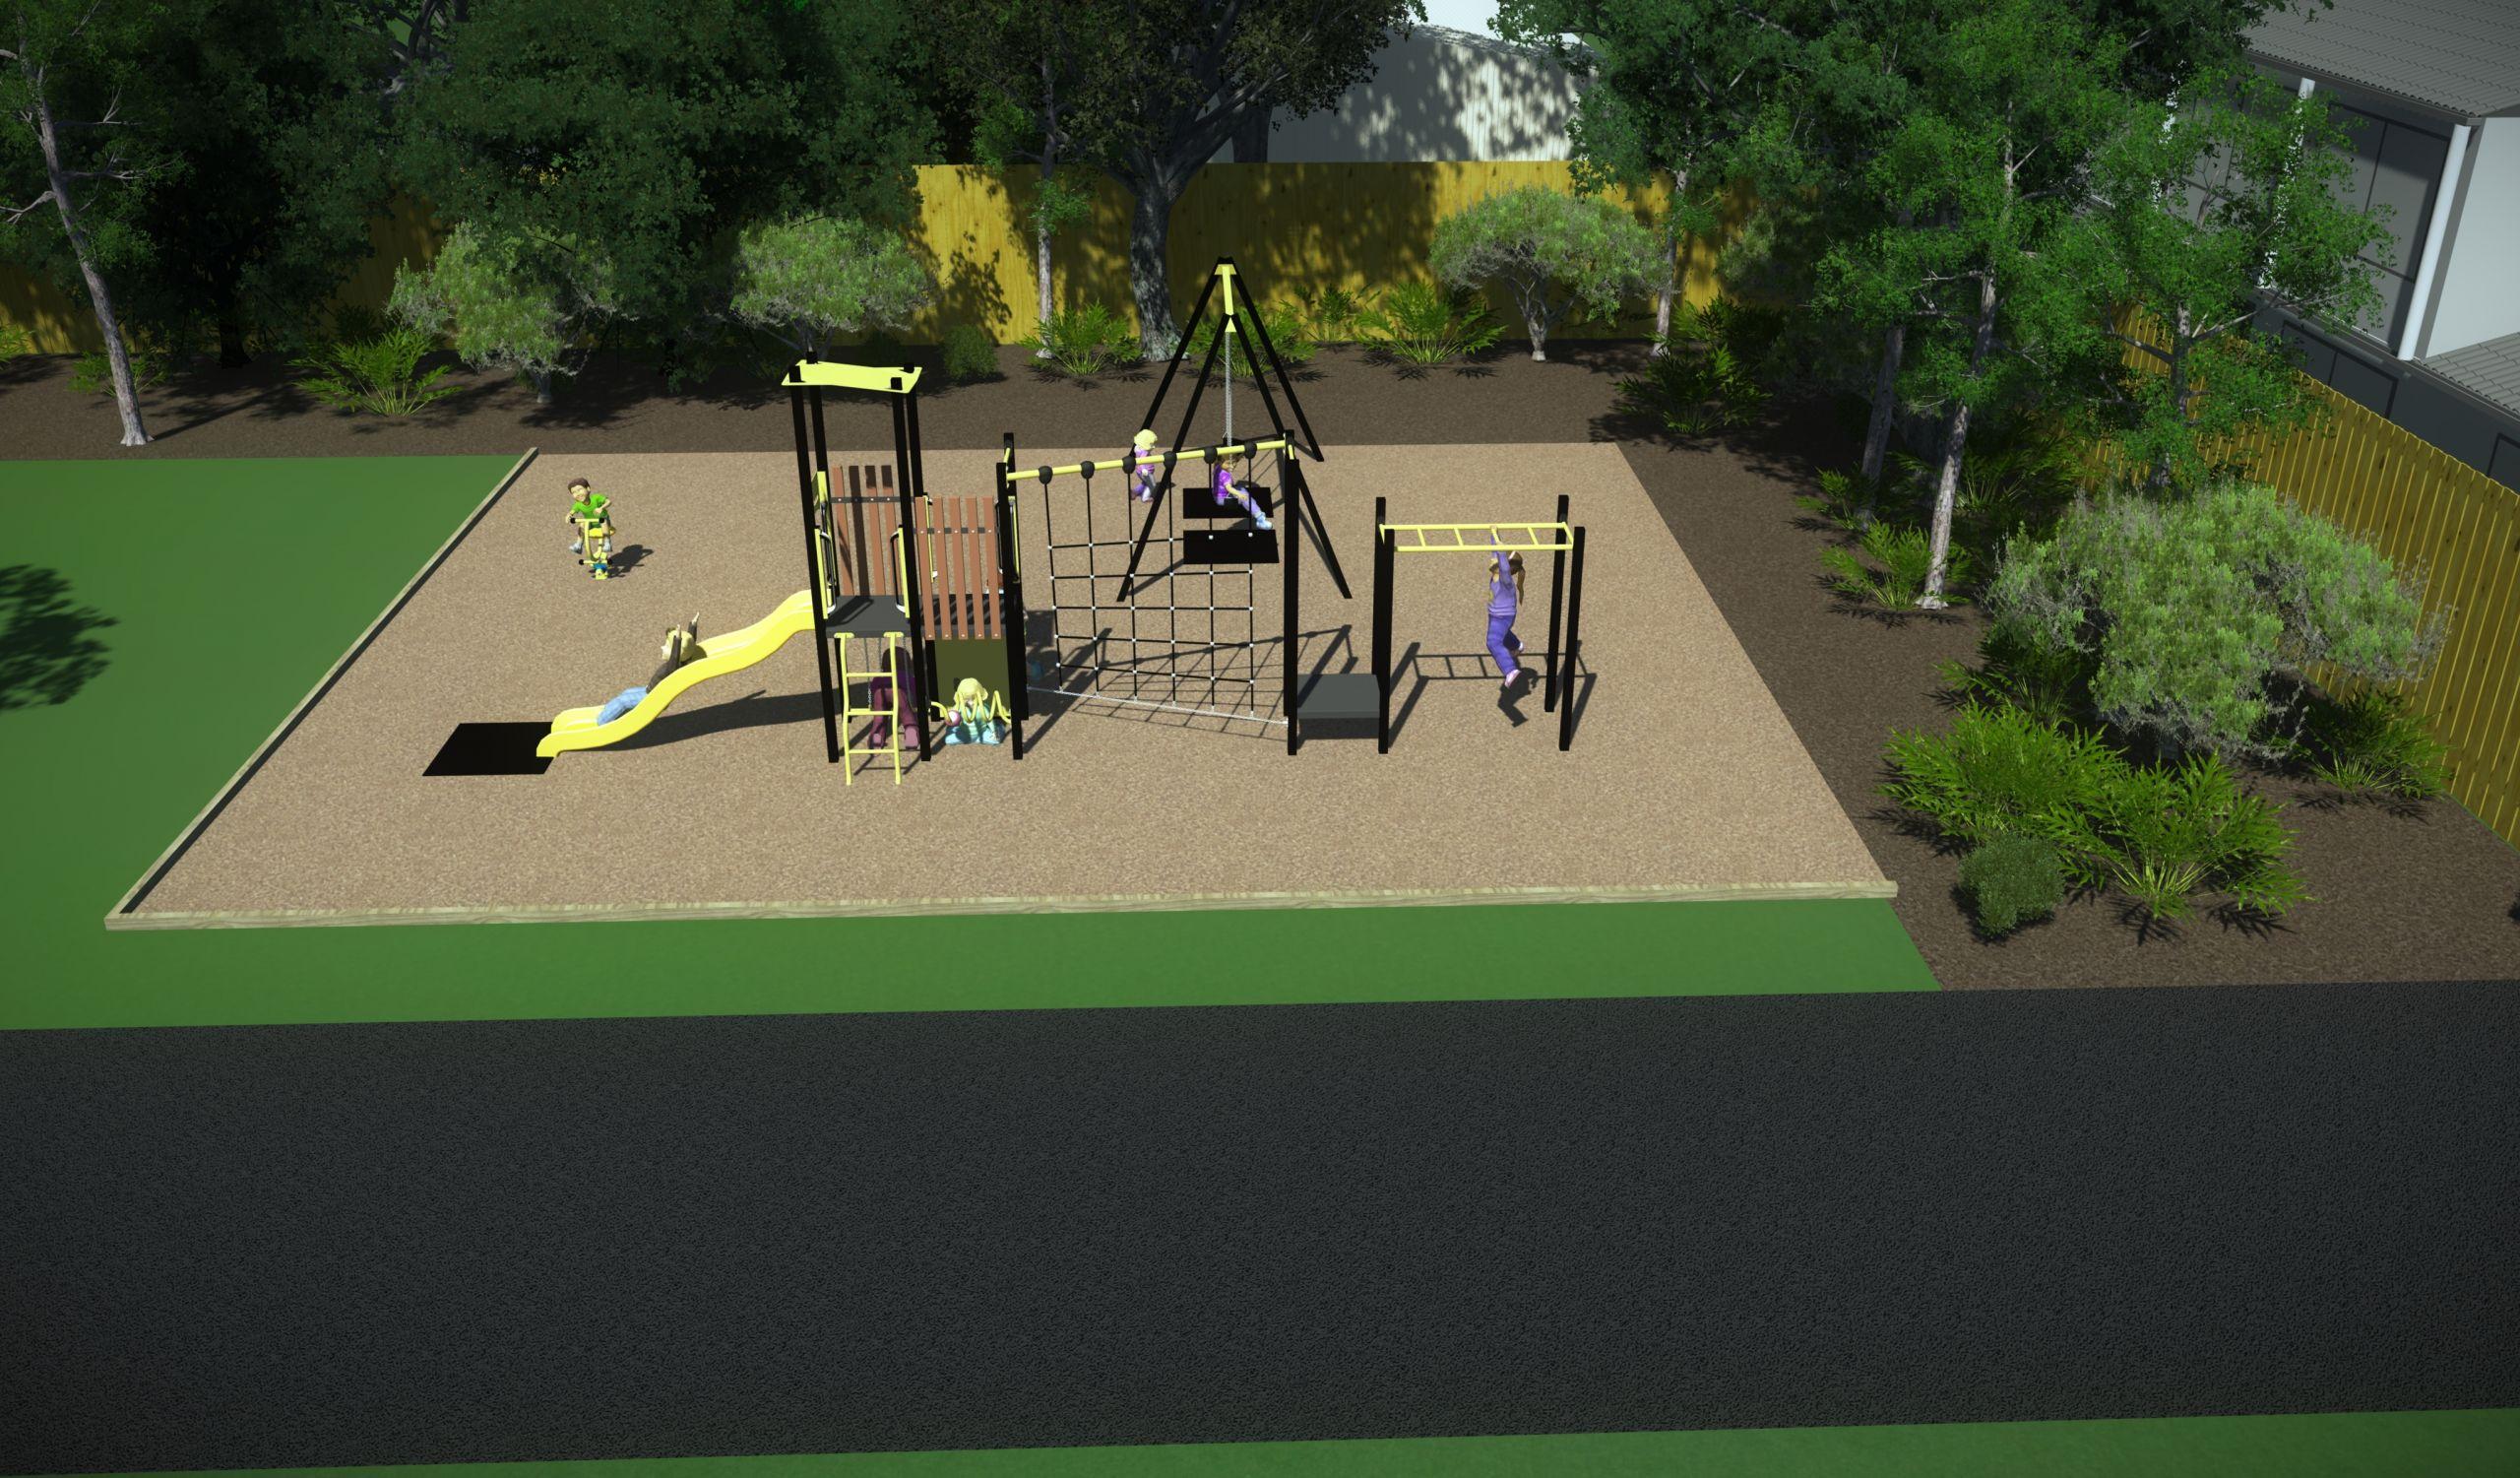 Buckingham Reserve Proposed Playground Design